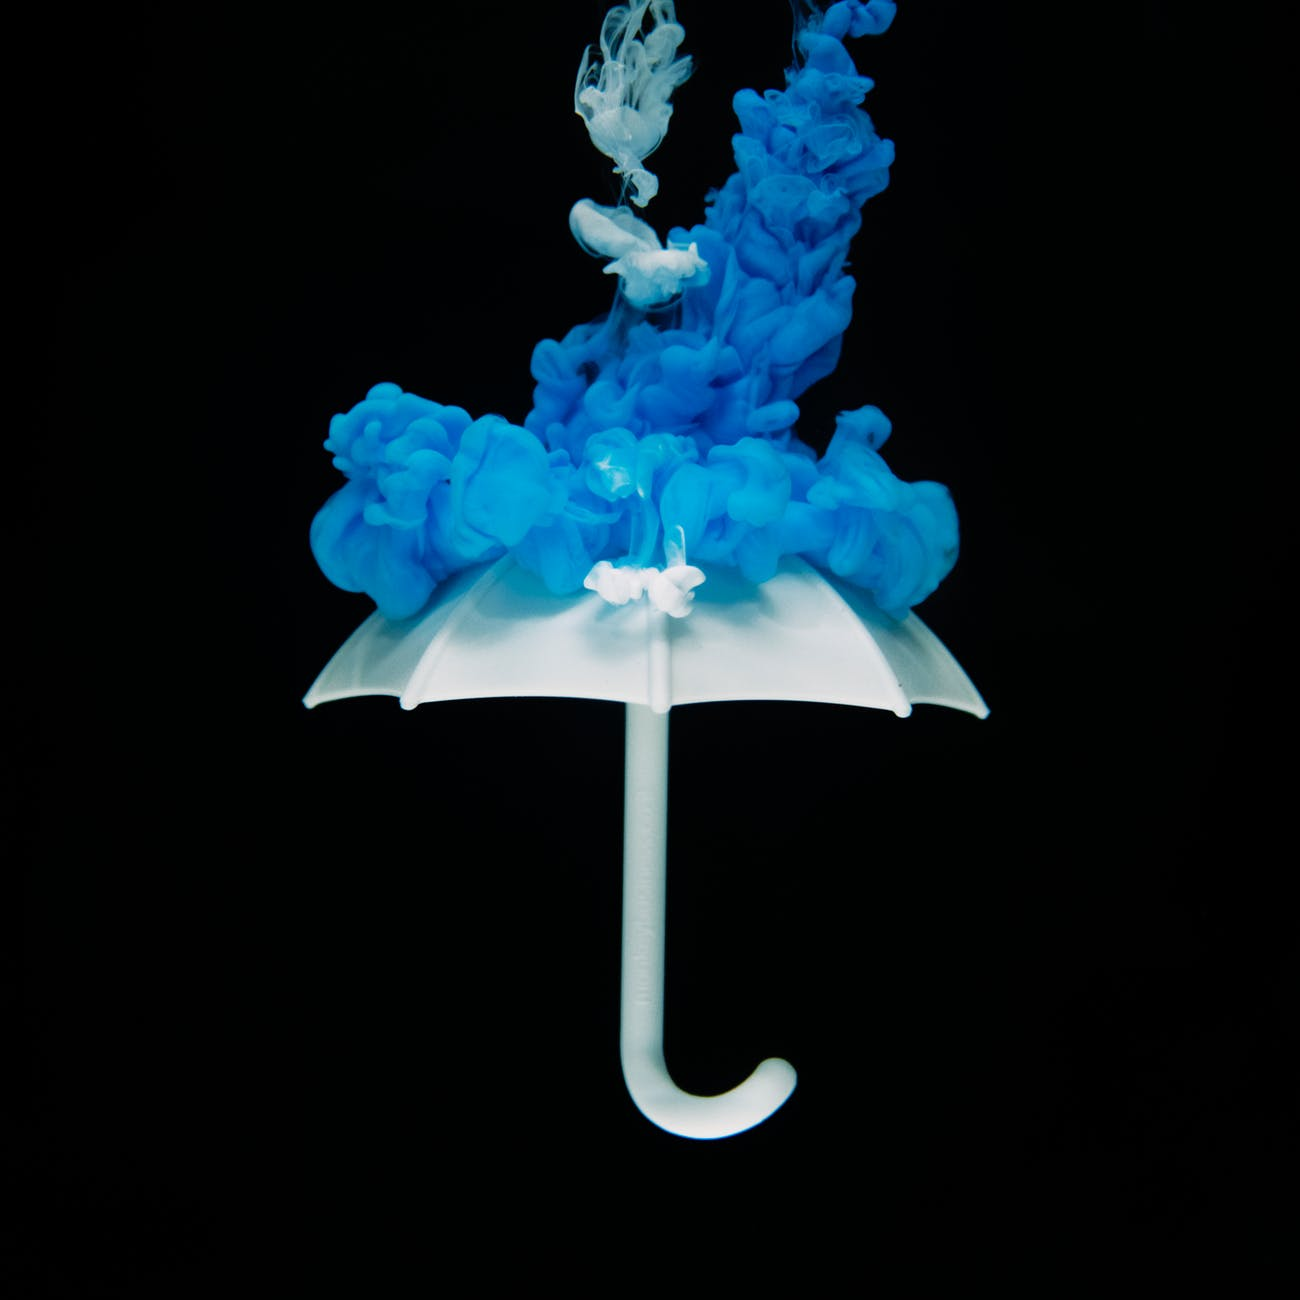 Umbrella woth smoke off top